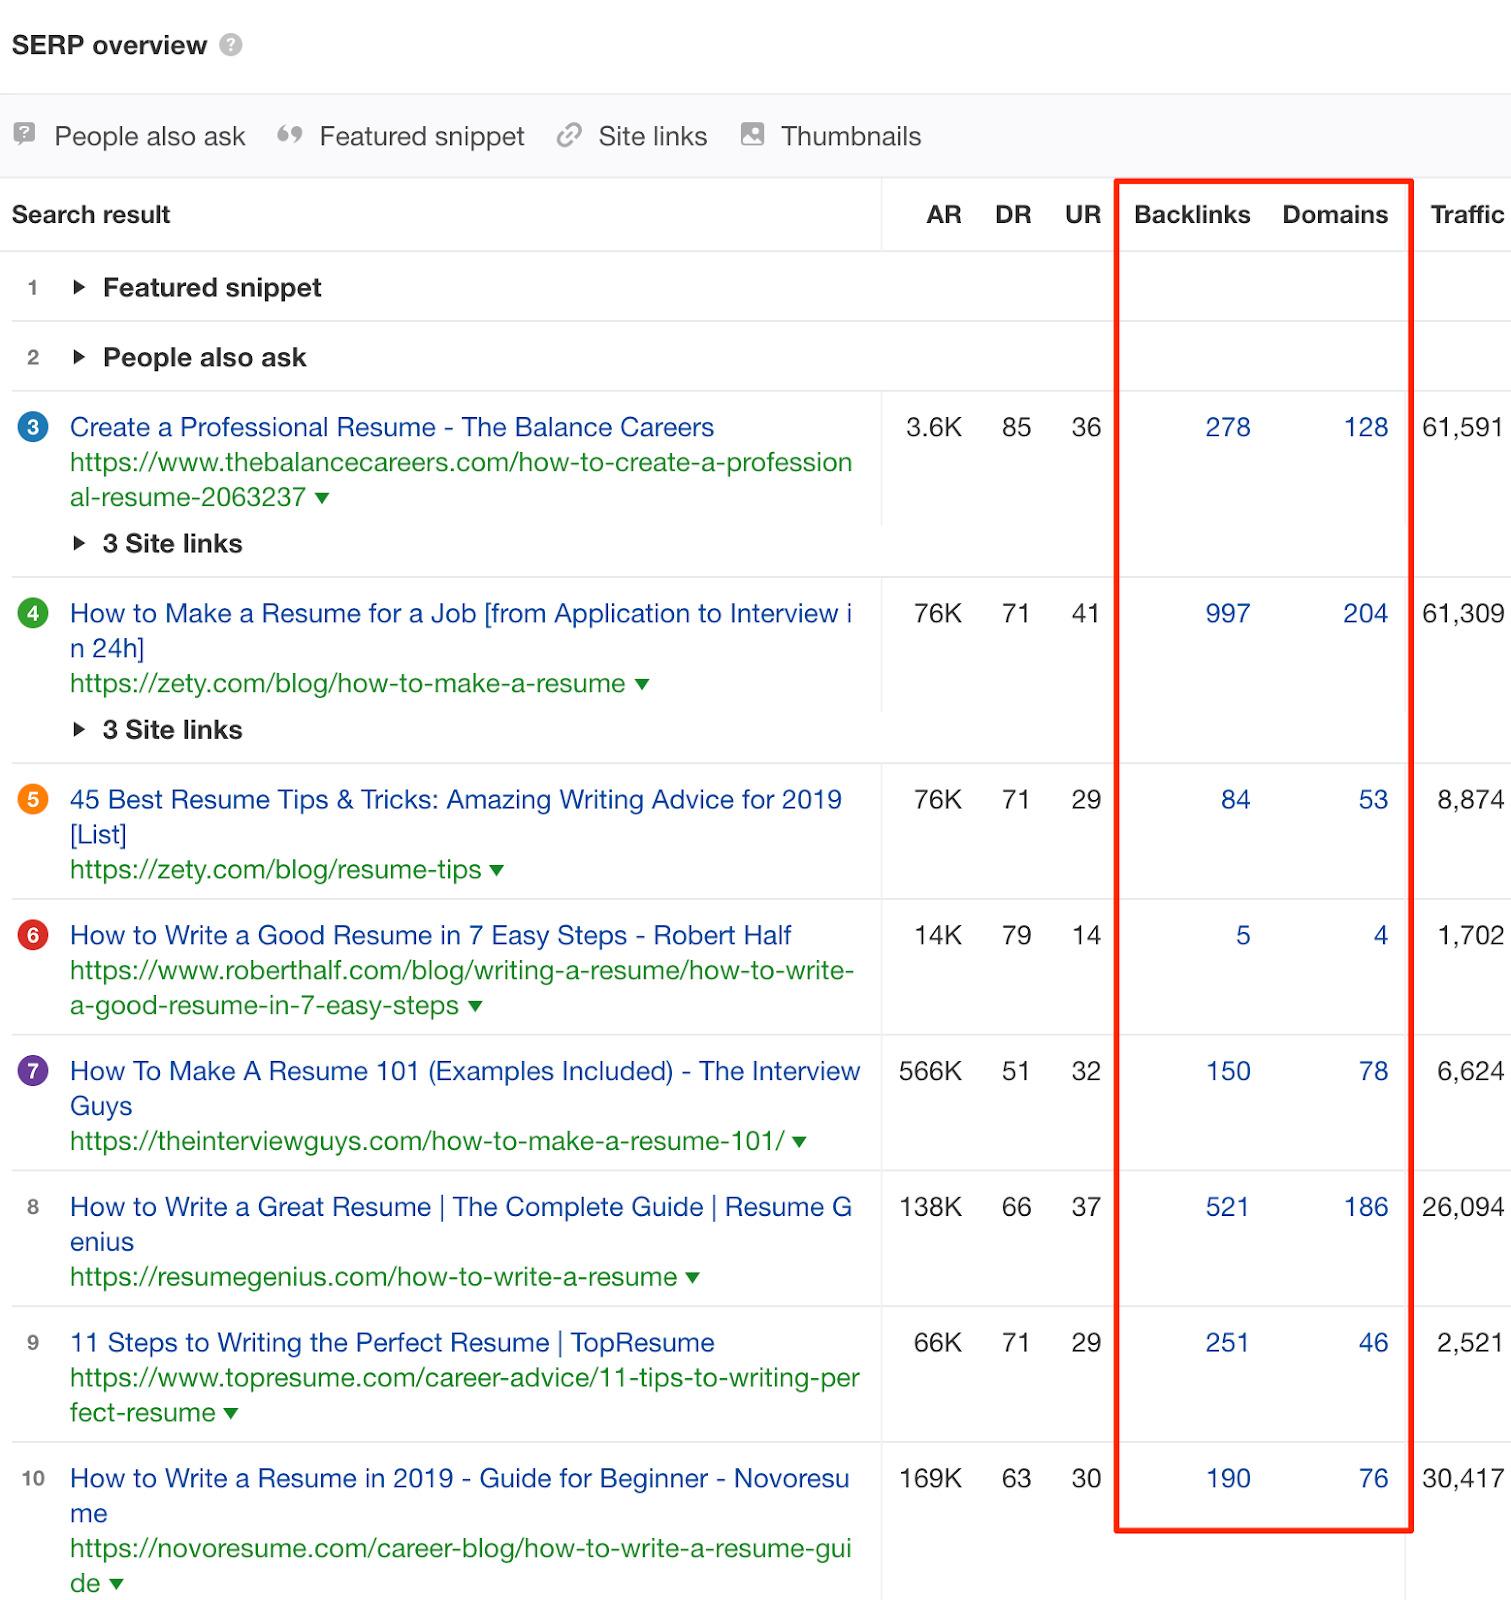 skyscraper_รับทำ SEO_บริษัทรับทำ SEO_กลยุทธ์ SEO_ทำ seo ติดอันดับหน้าแรก_เทคนิค SEO_เทคนิคการทำ SEO_เทคนิคการตลาดออนไลน์_ทํา seo google